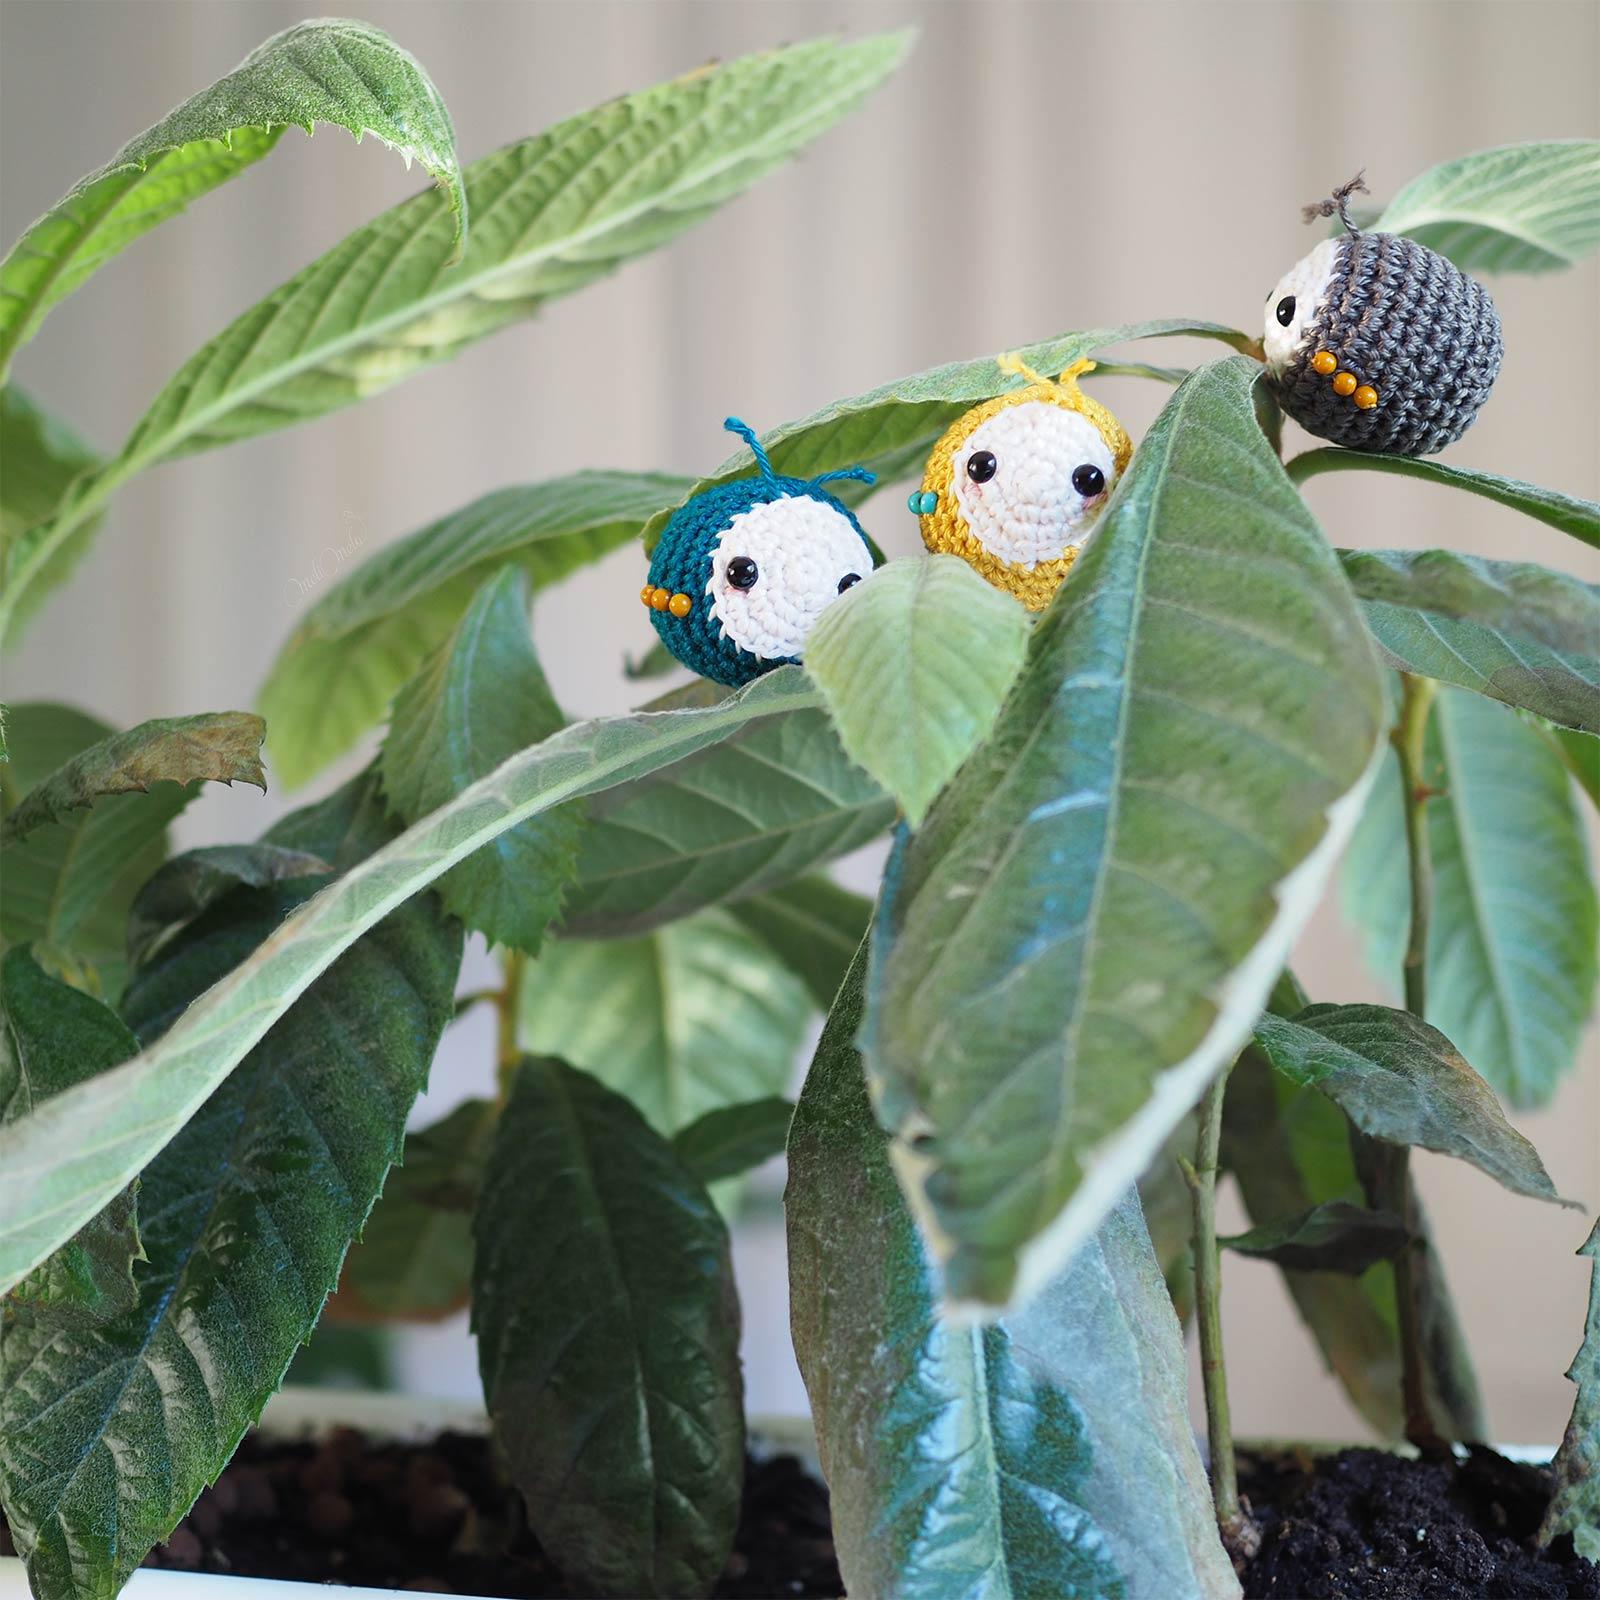 crochet insectes aphid aphidoidea Laylala beetles Scheppjes serial crocheteuses more 443 néflier laboutiquedemelimelo